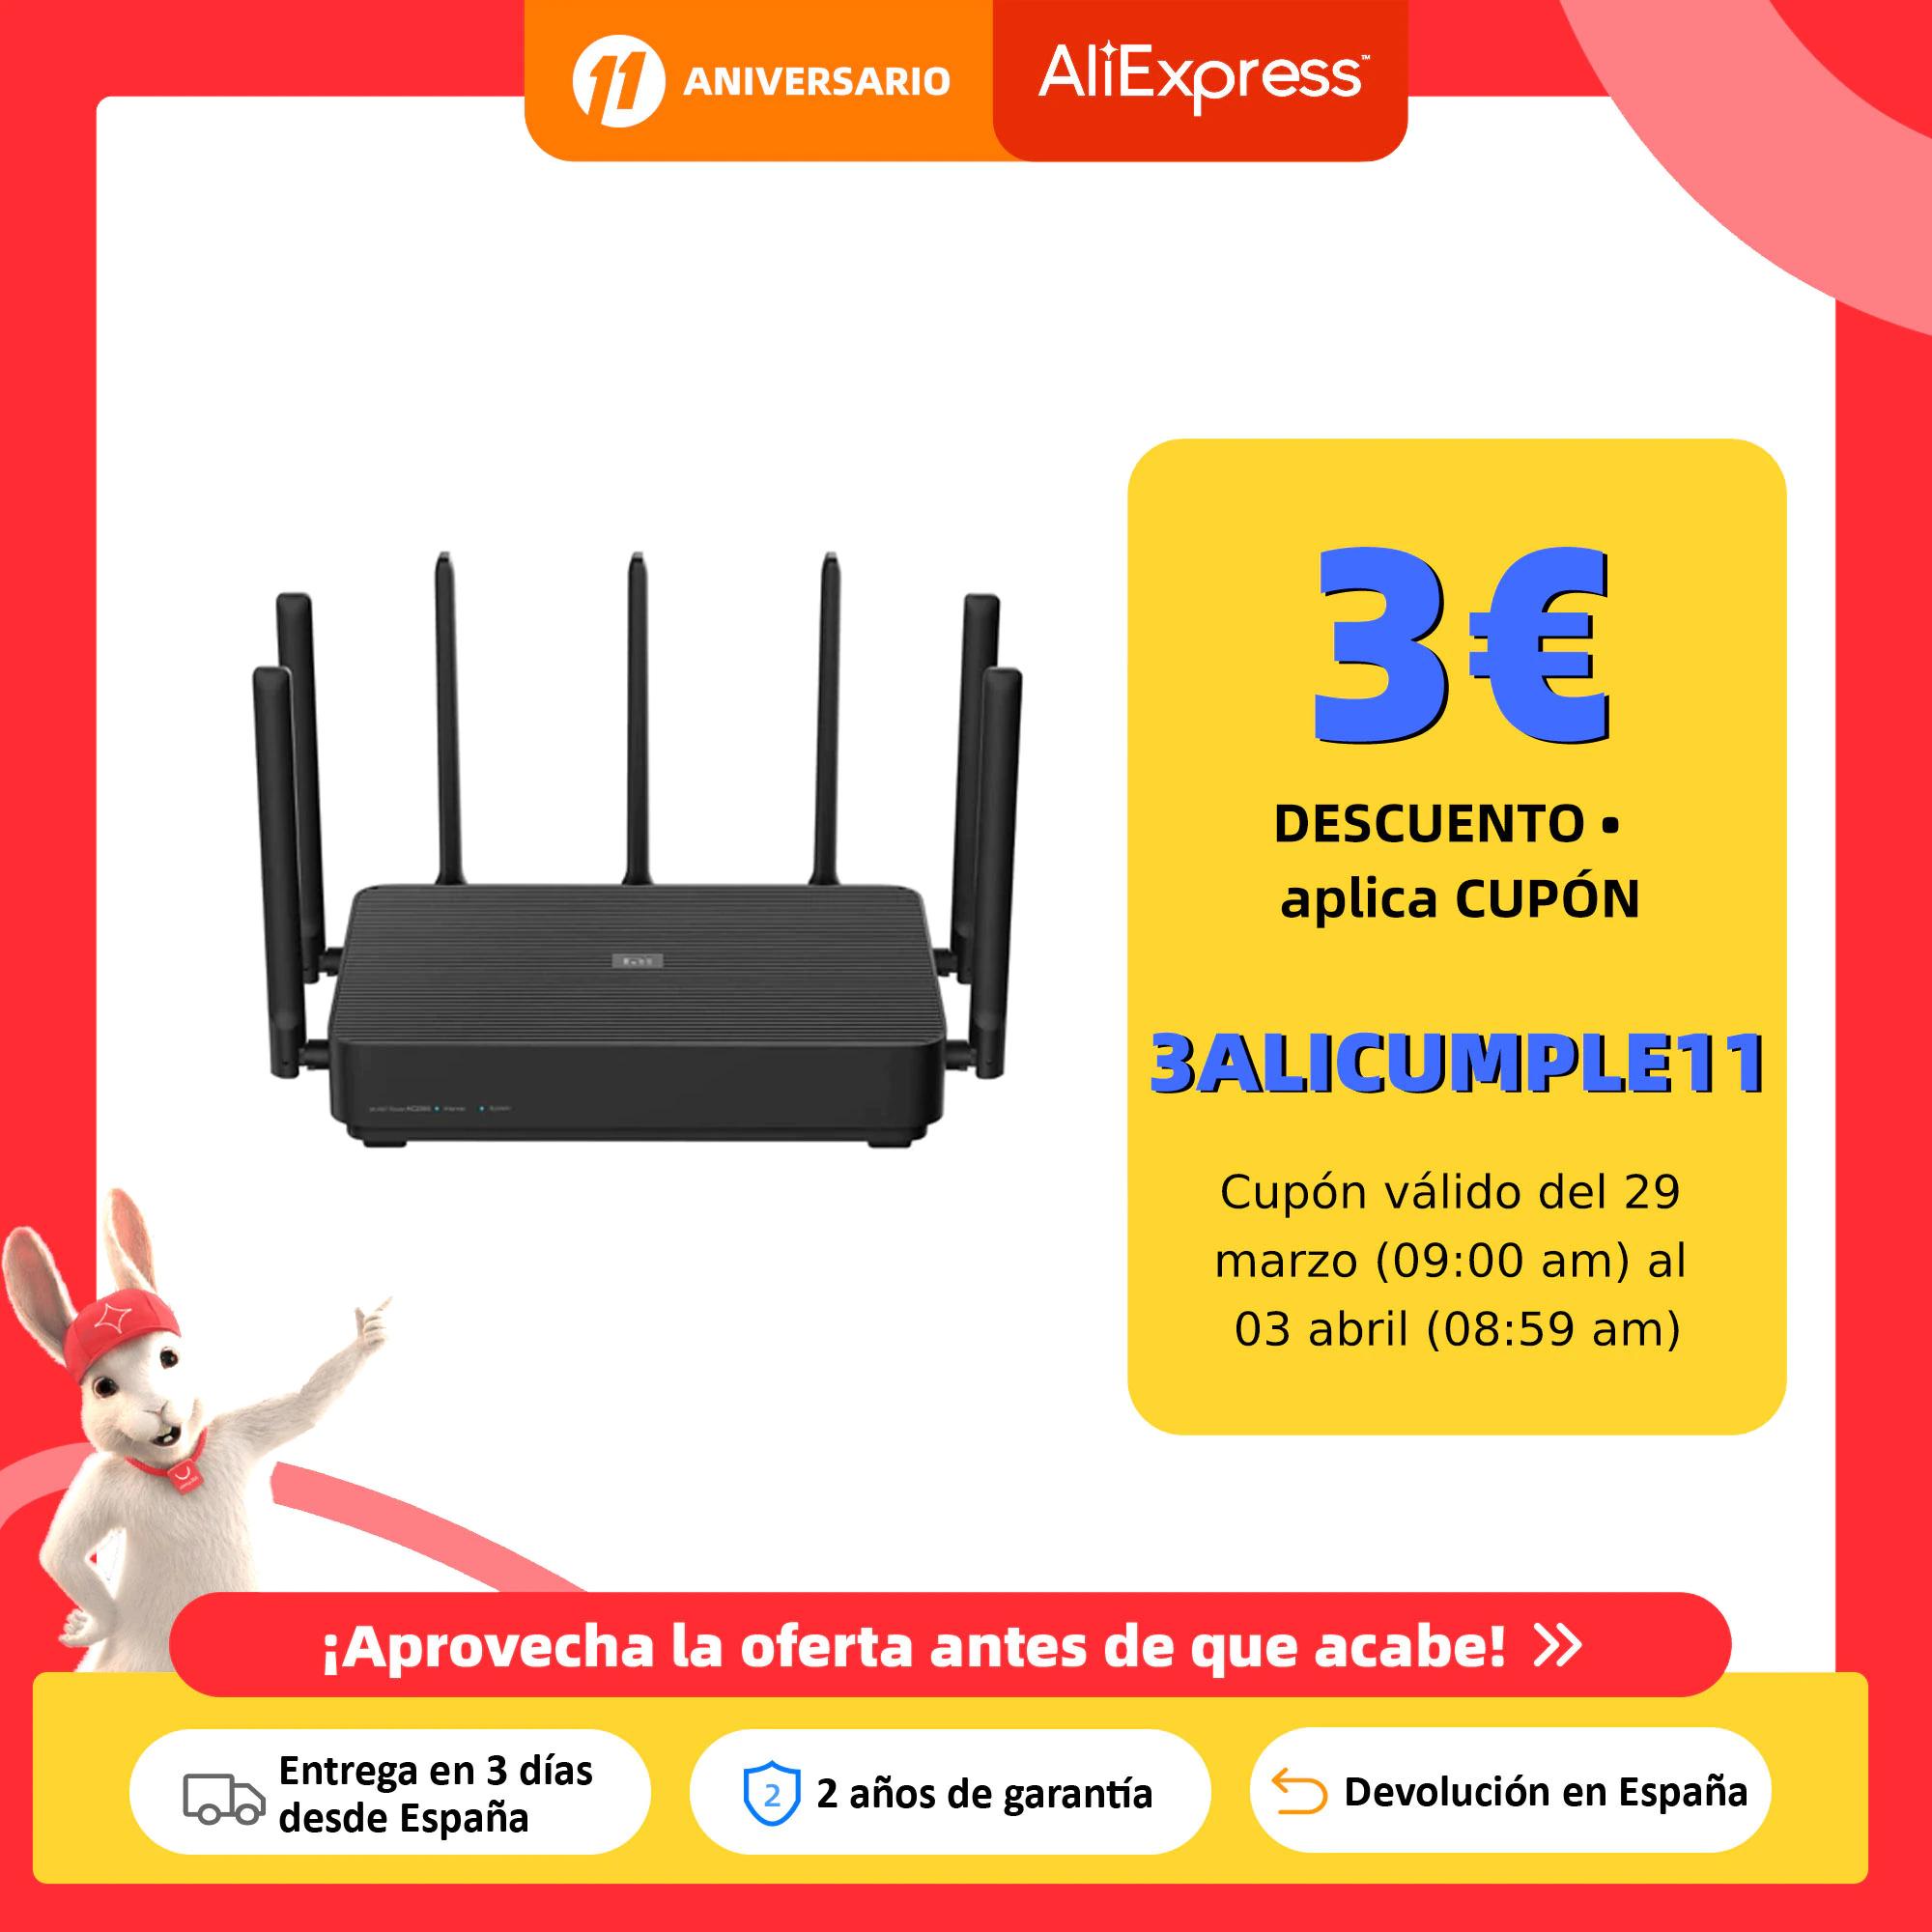 Xioami Mi Aiot Router AC2350, 2200 Mbps, Qualcomm CPU, 7 antenas externas, ROM 16 MB, RAM 128 MB - Desde España